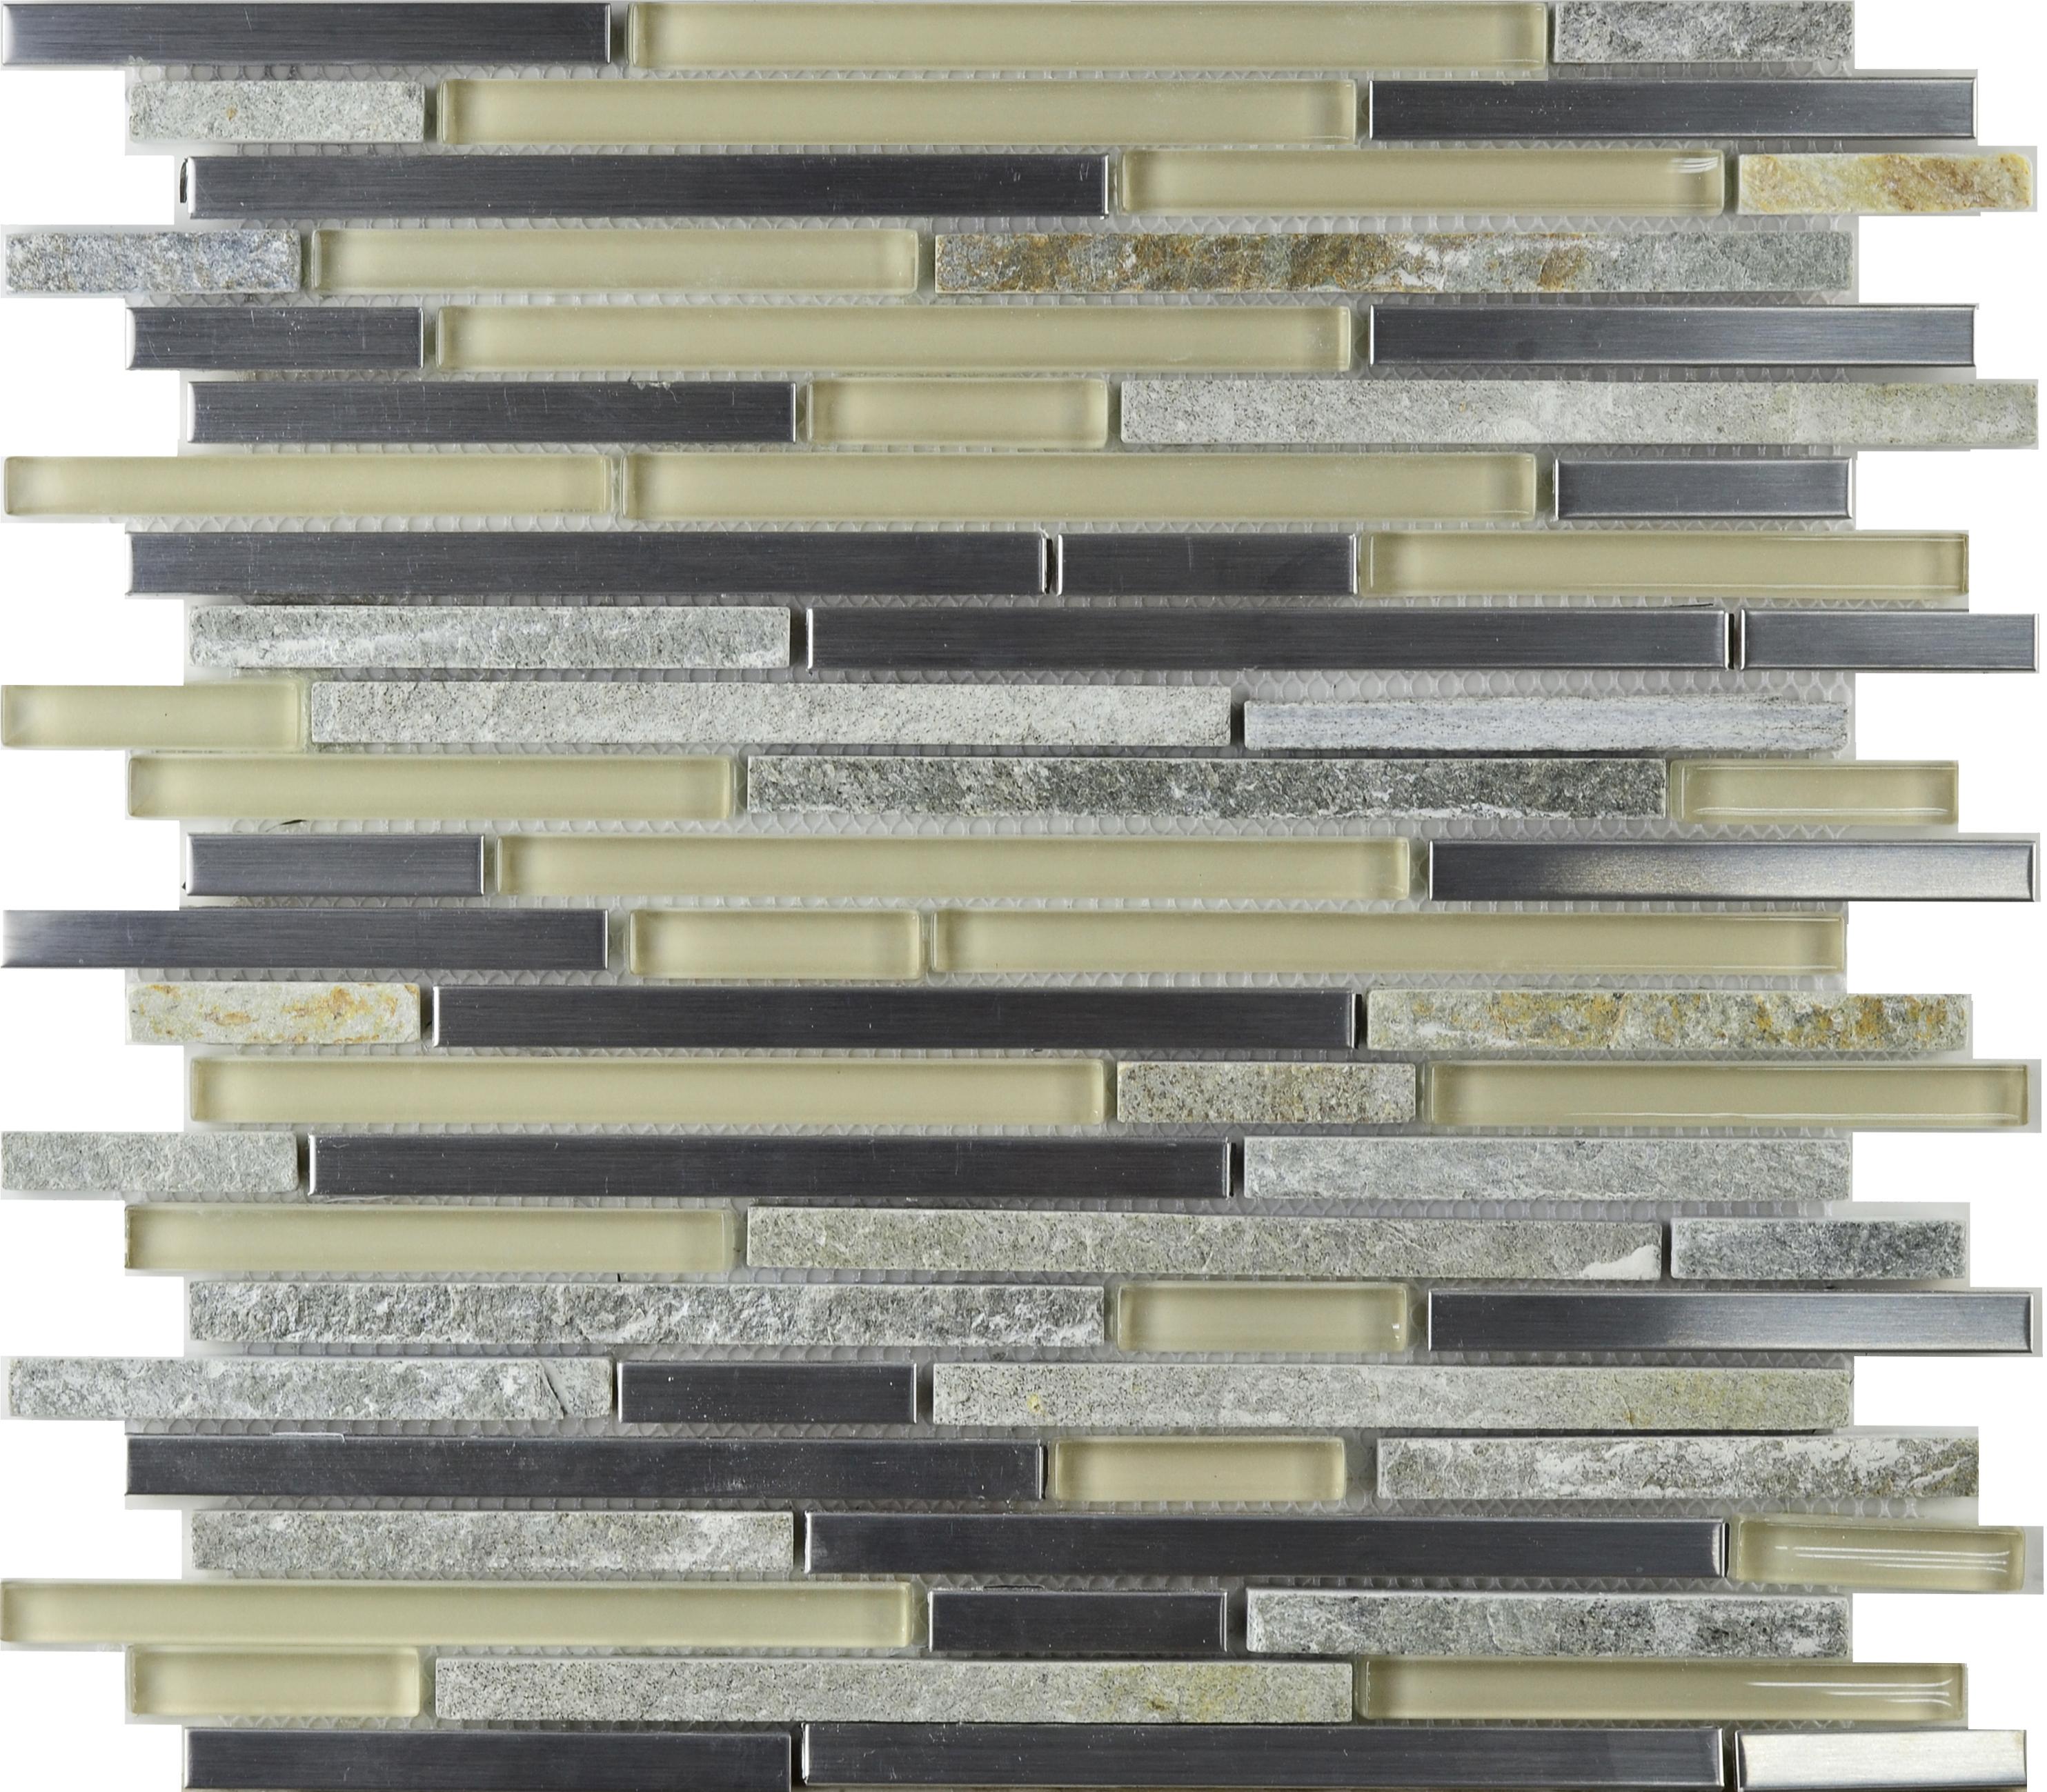 Cinque Glana Grau/beige be-PMLK180 Mosaik 30x30